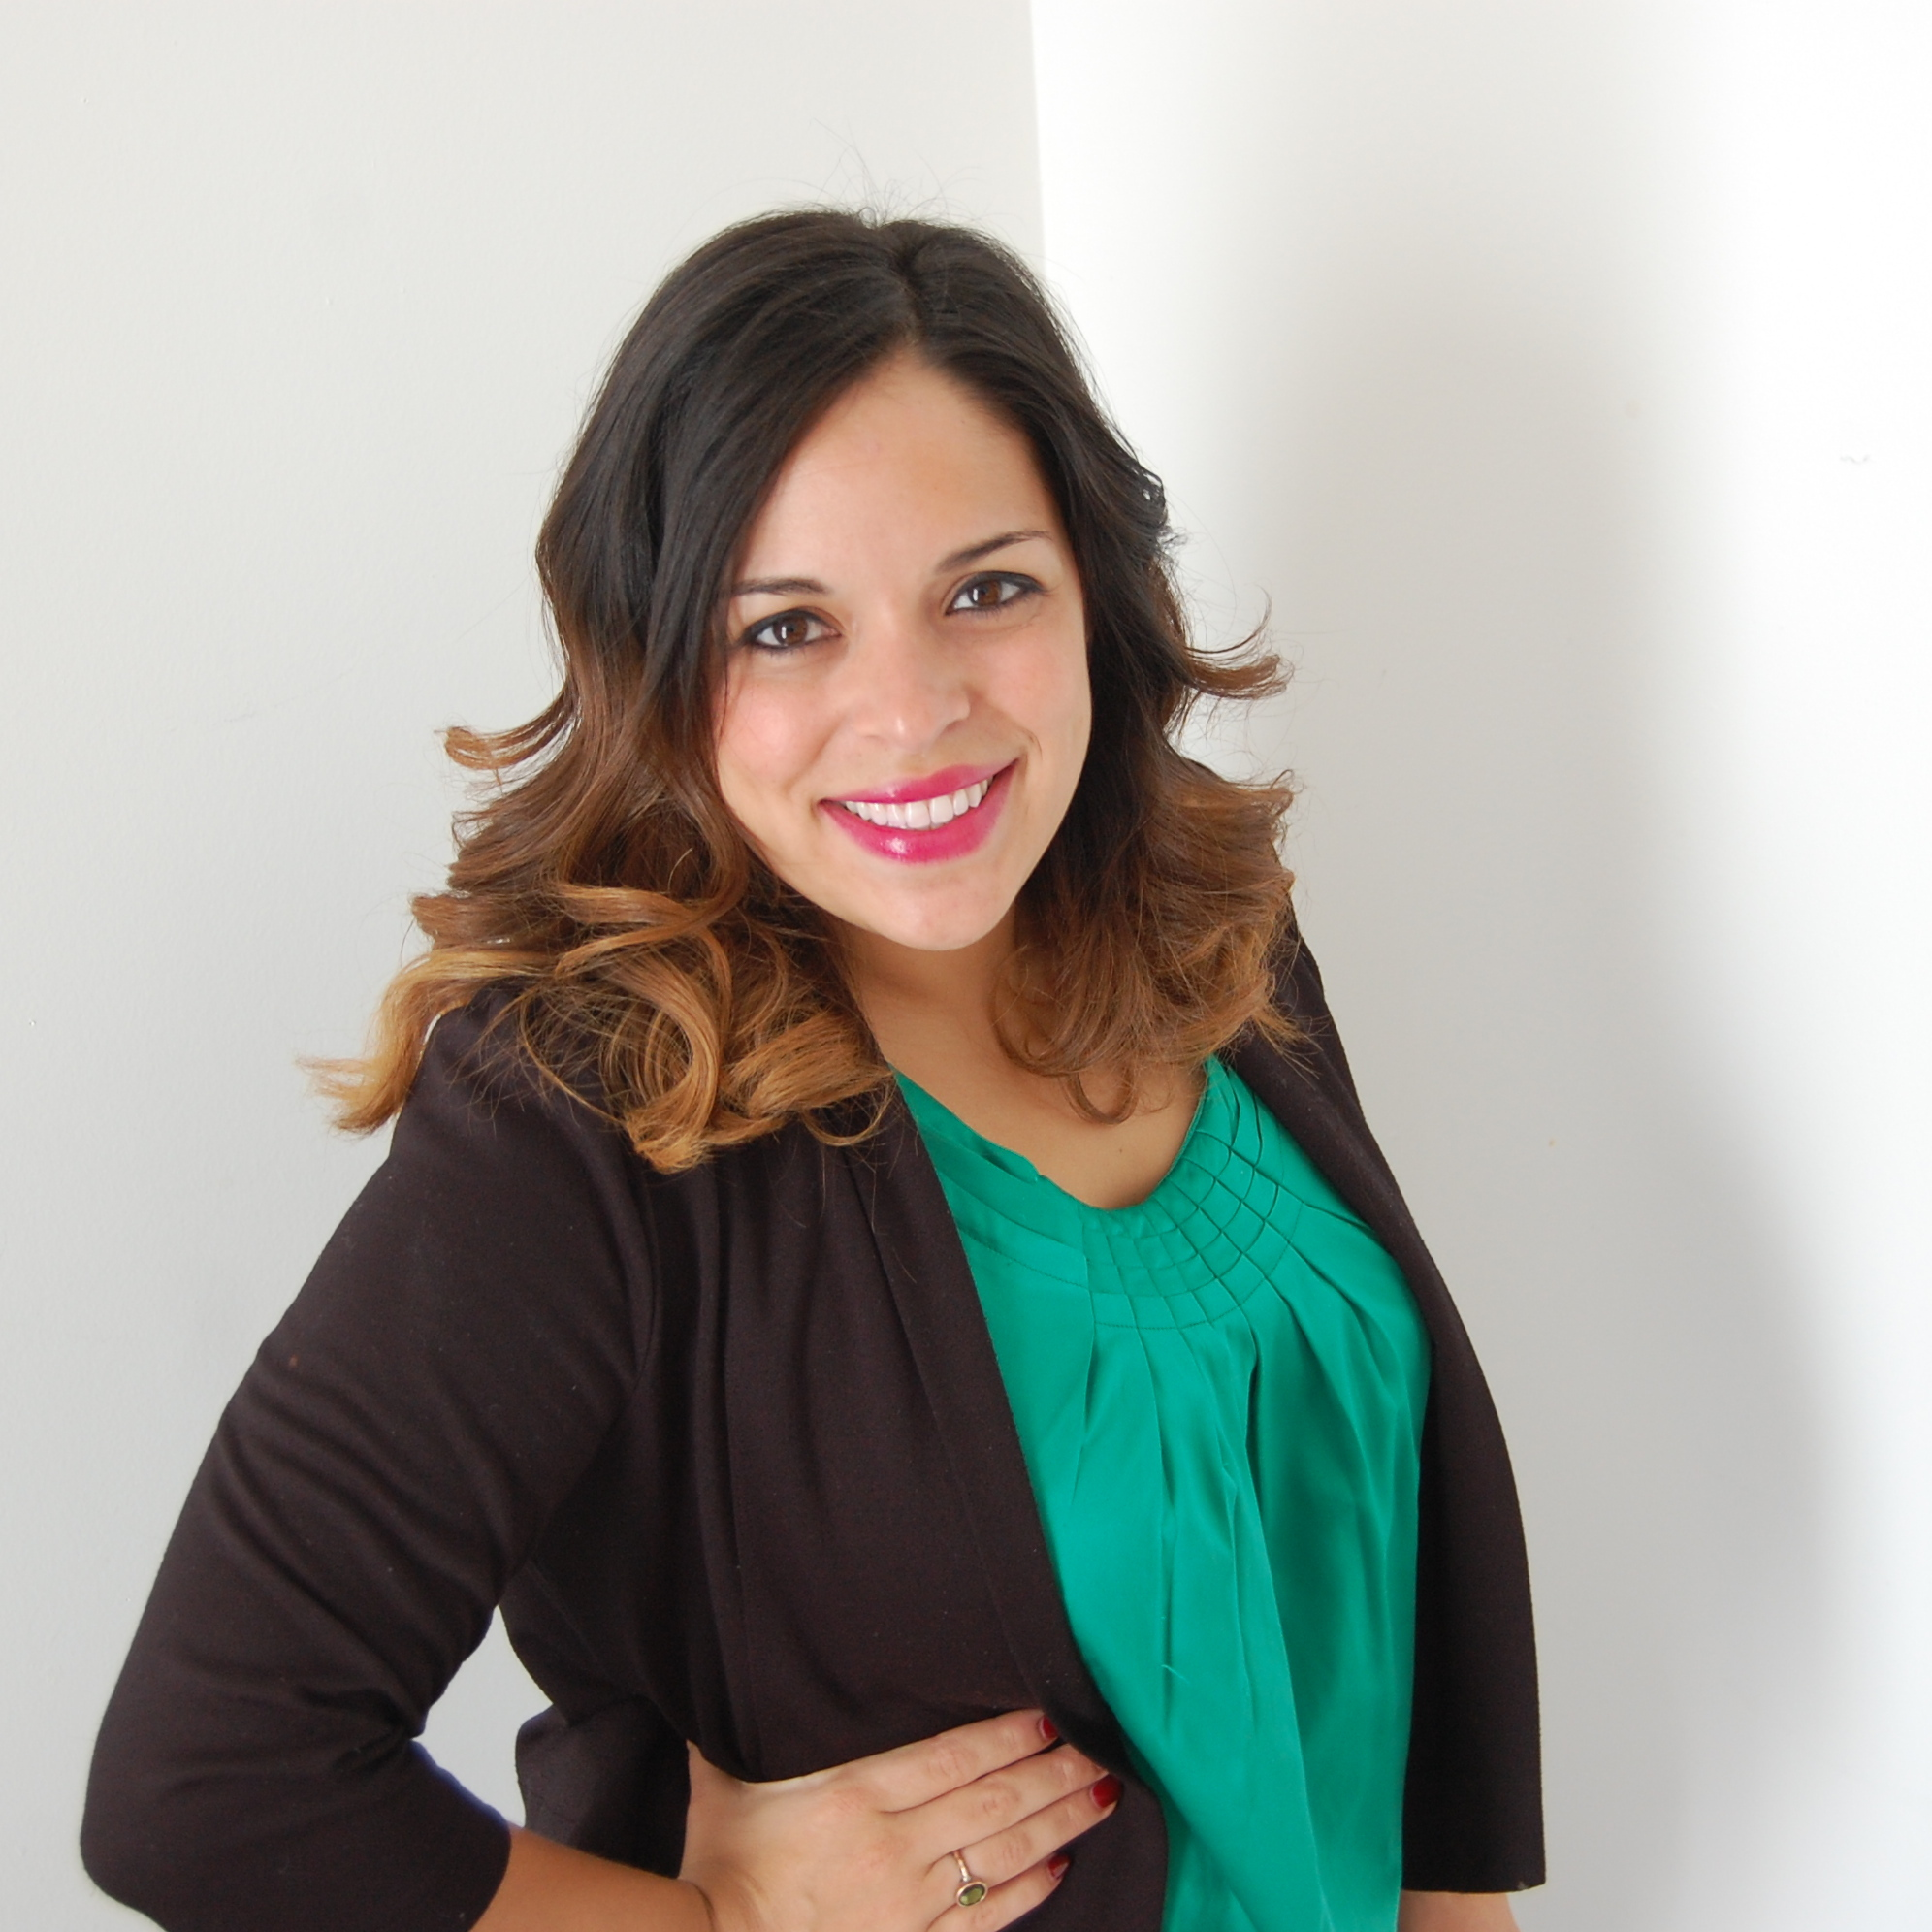 Aslyne Rodriguez